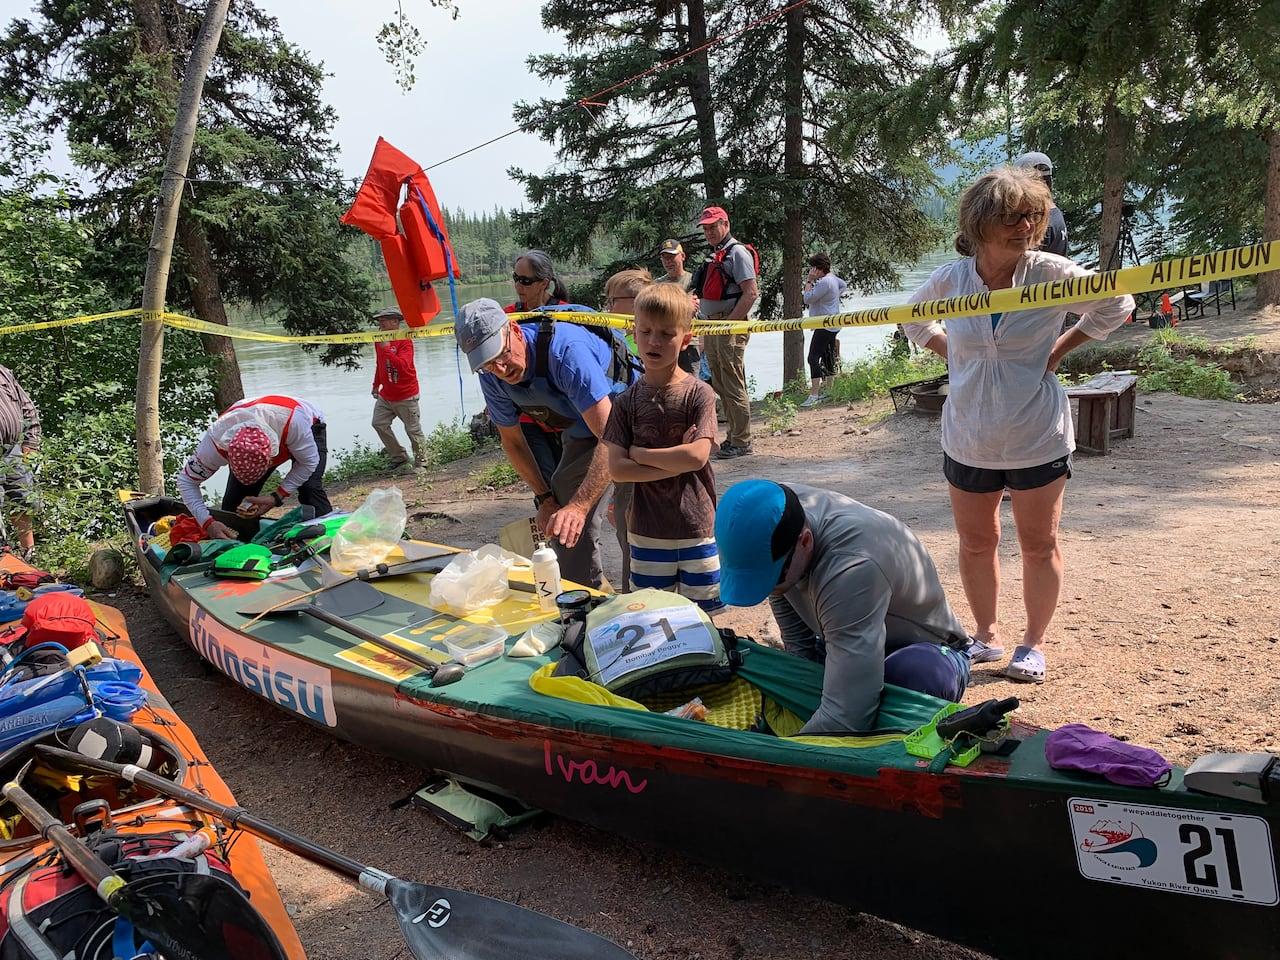 Sask  canoeists win epic Yukon River Quest race | CBC News